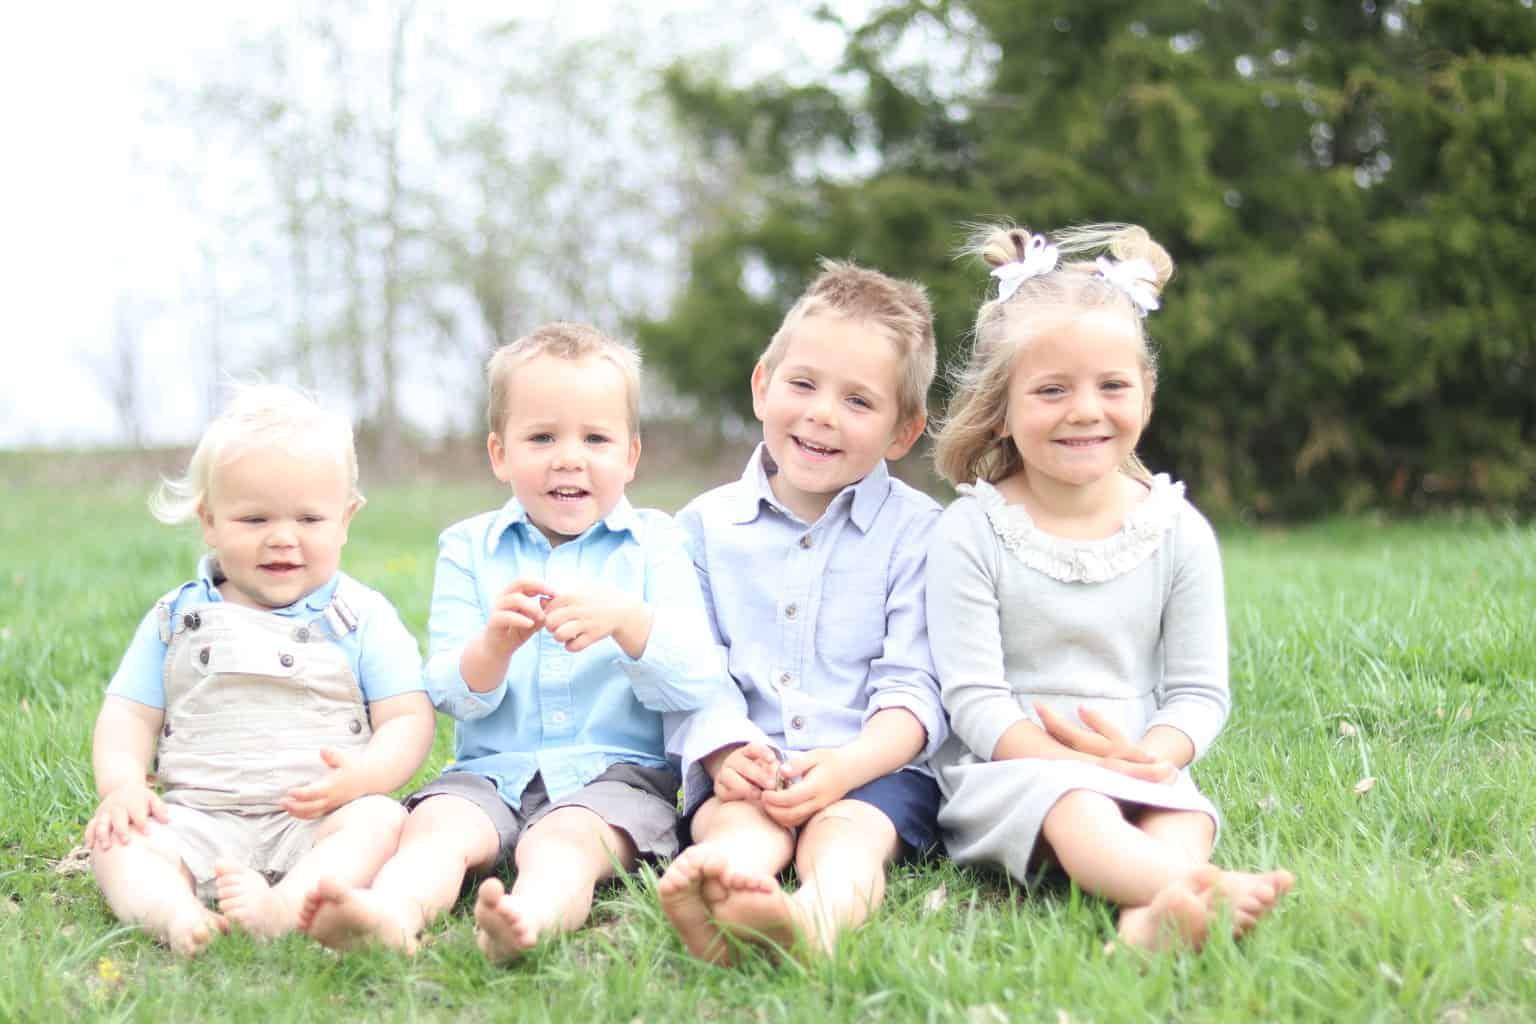 Four little children sitting on the grass.